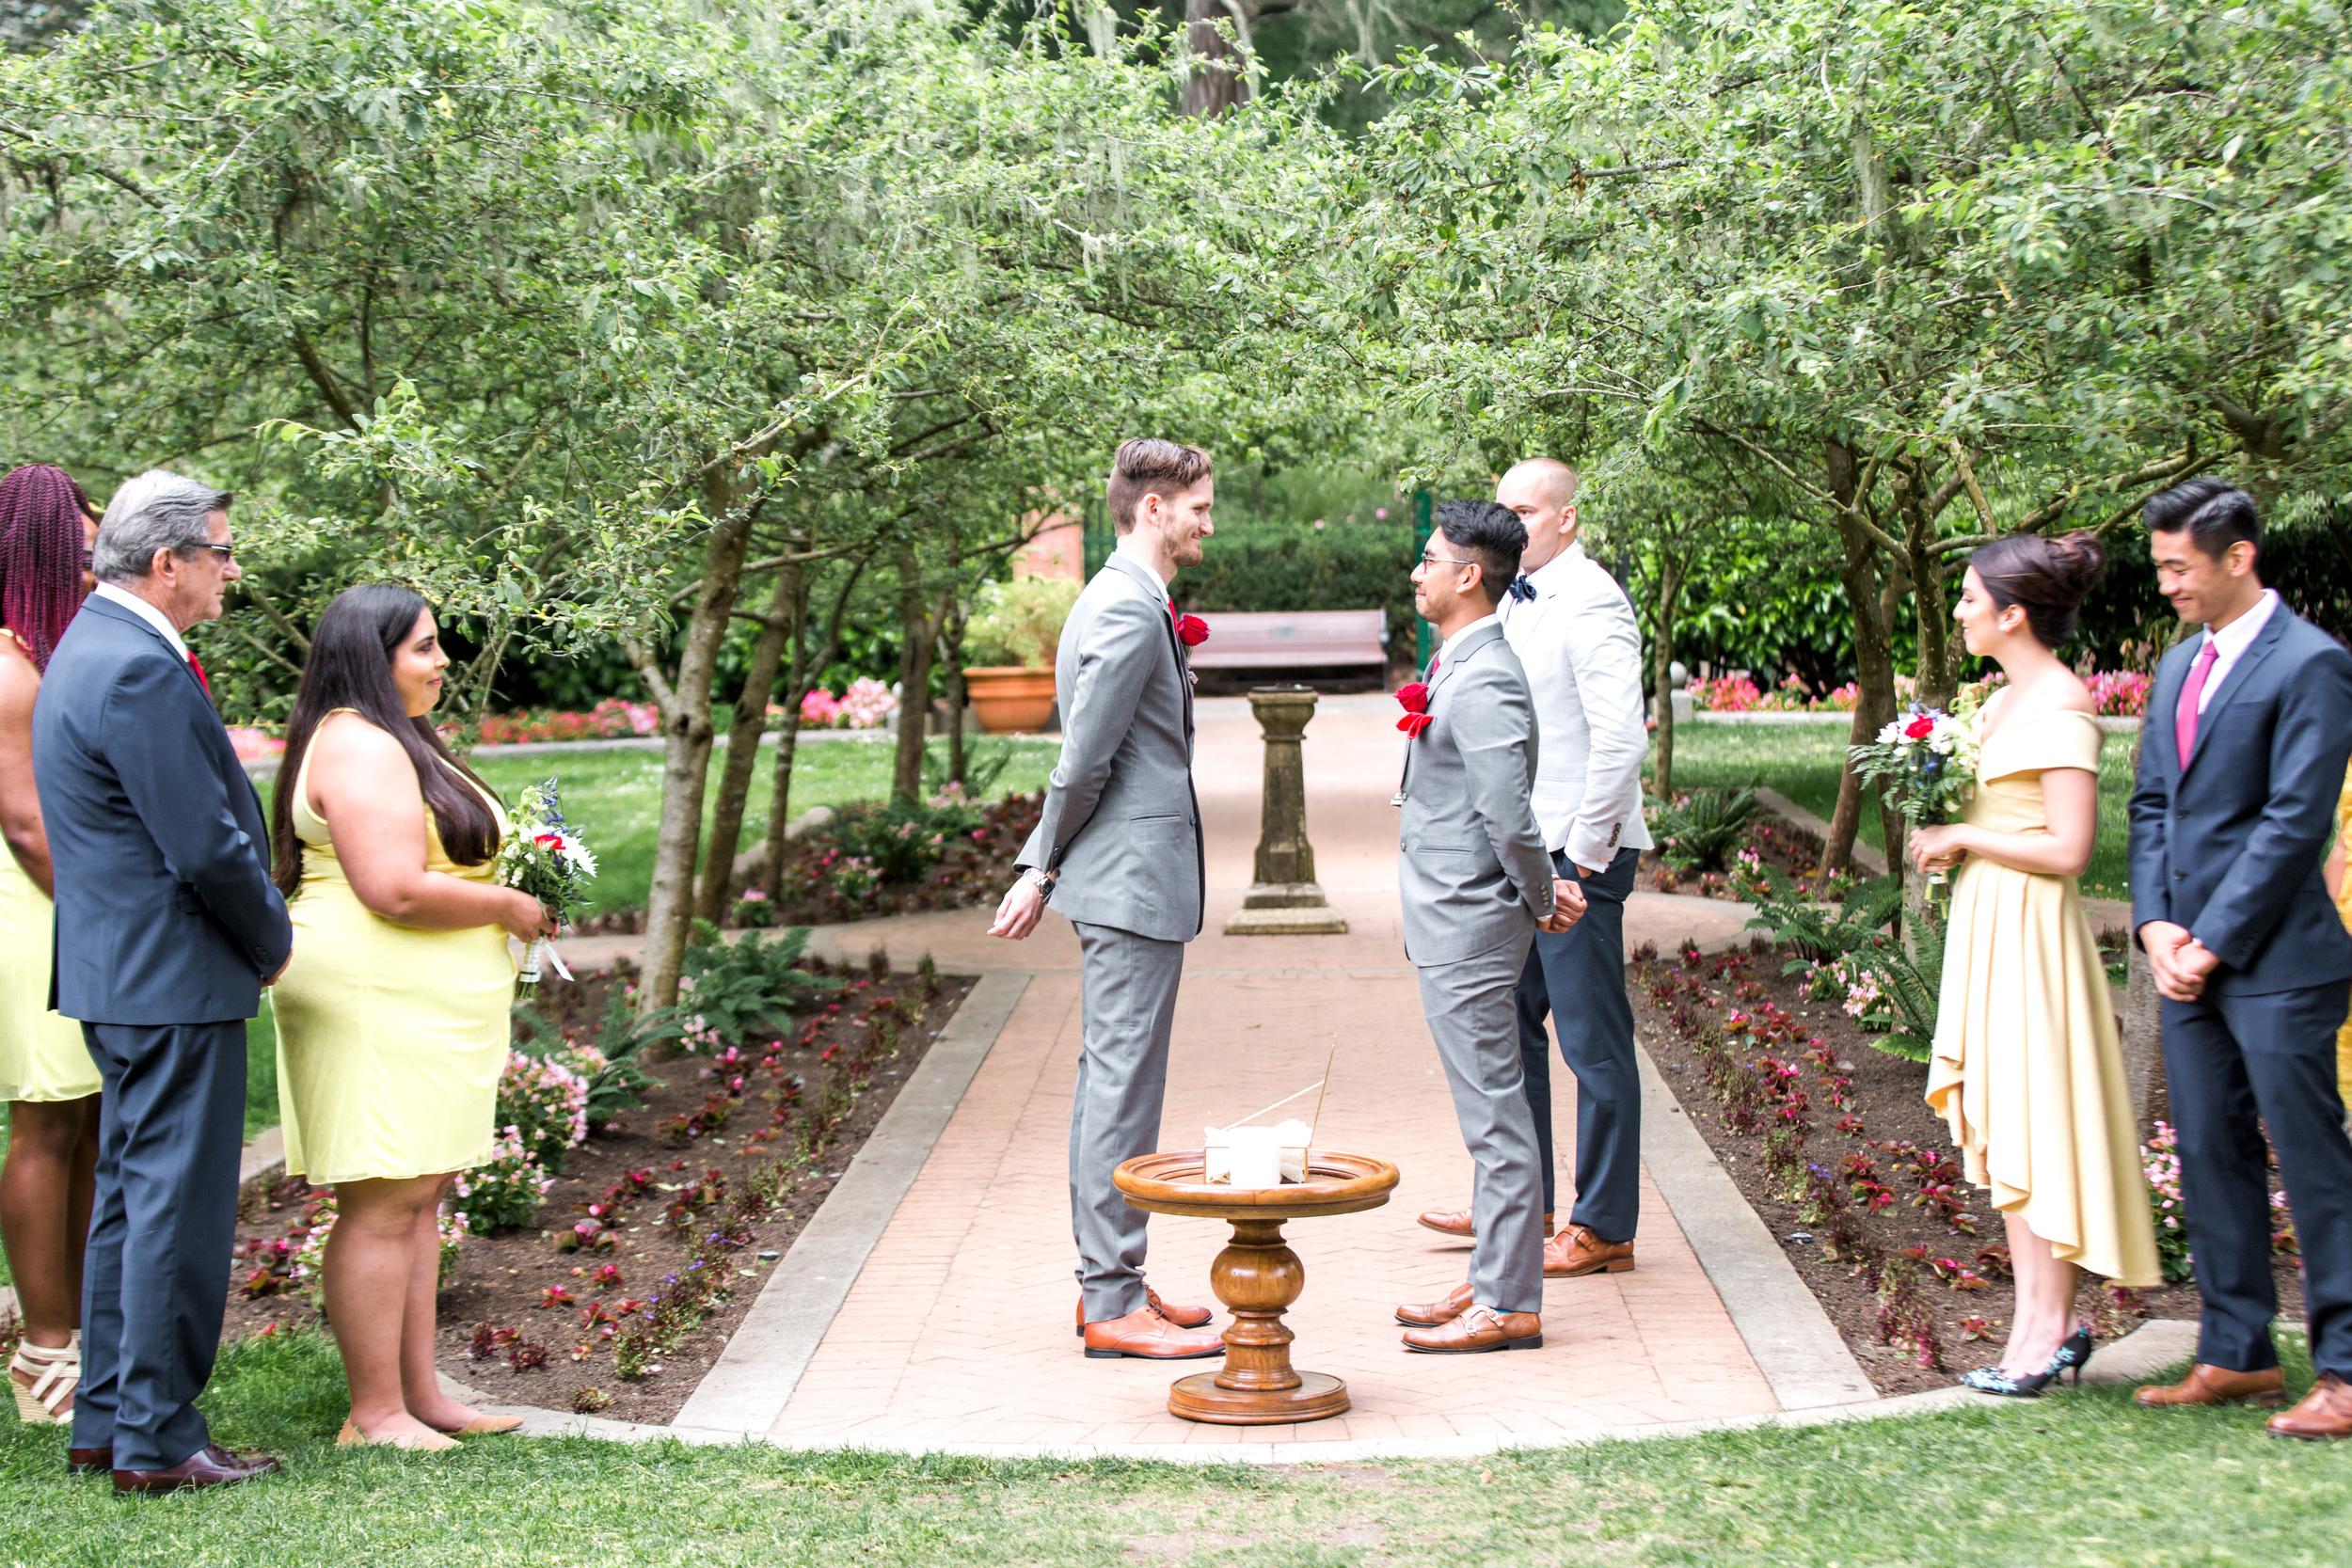 shakespeare-garden-golden-gate-park-san-francisco-wedding-photography-8.jpg